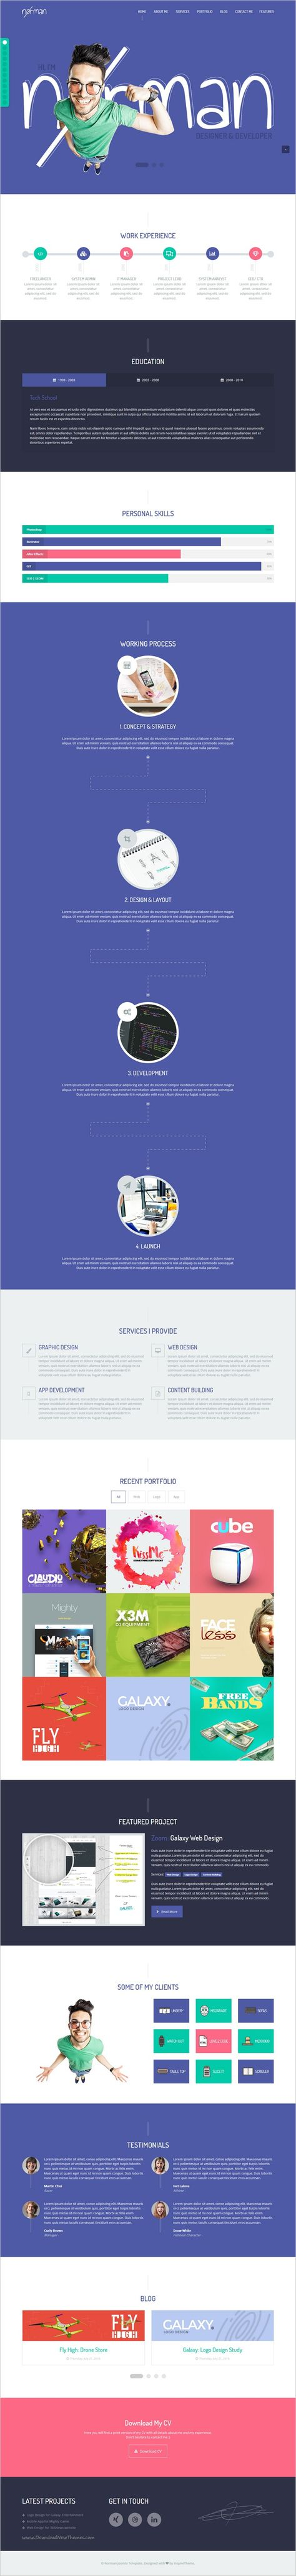 it norman cv portfolio and freelancer joomla template gantry 5 clean design resume cv and website designs - Resume Cv Joomla Template